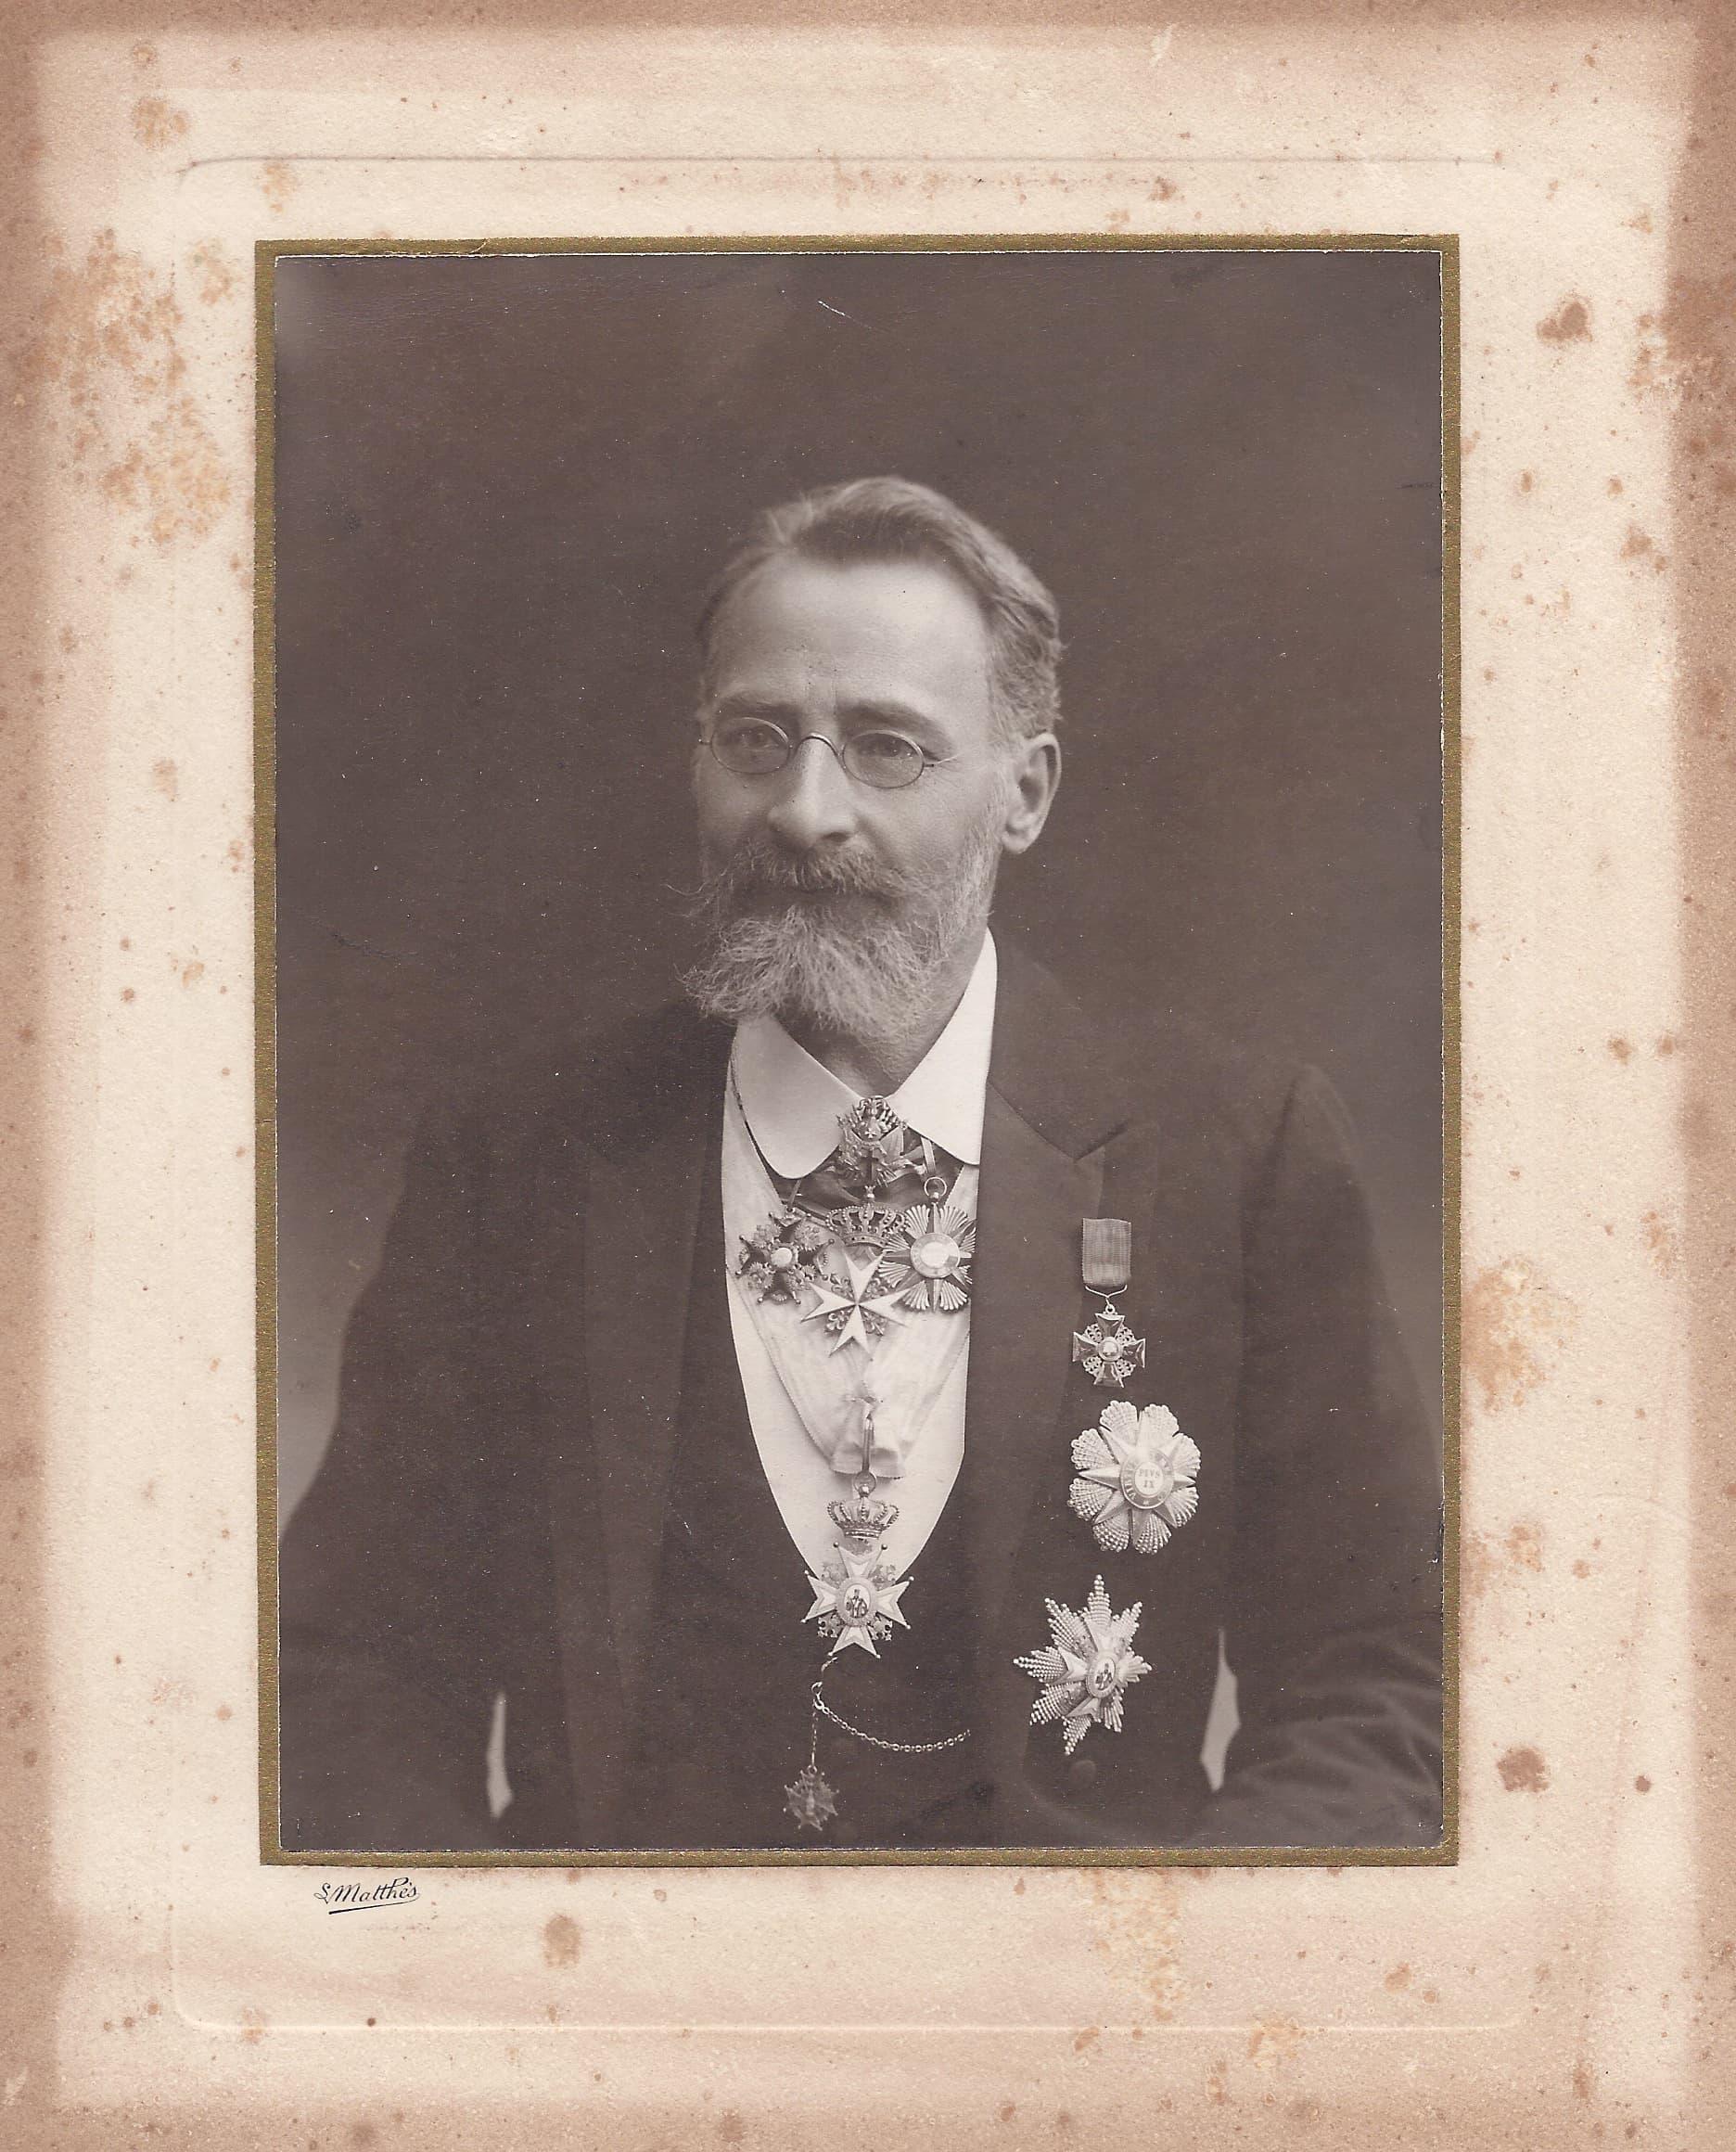 The Marquis de Mauroy